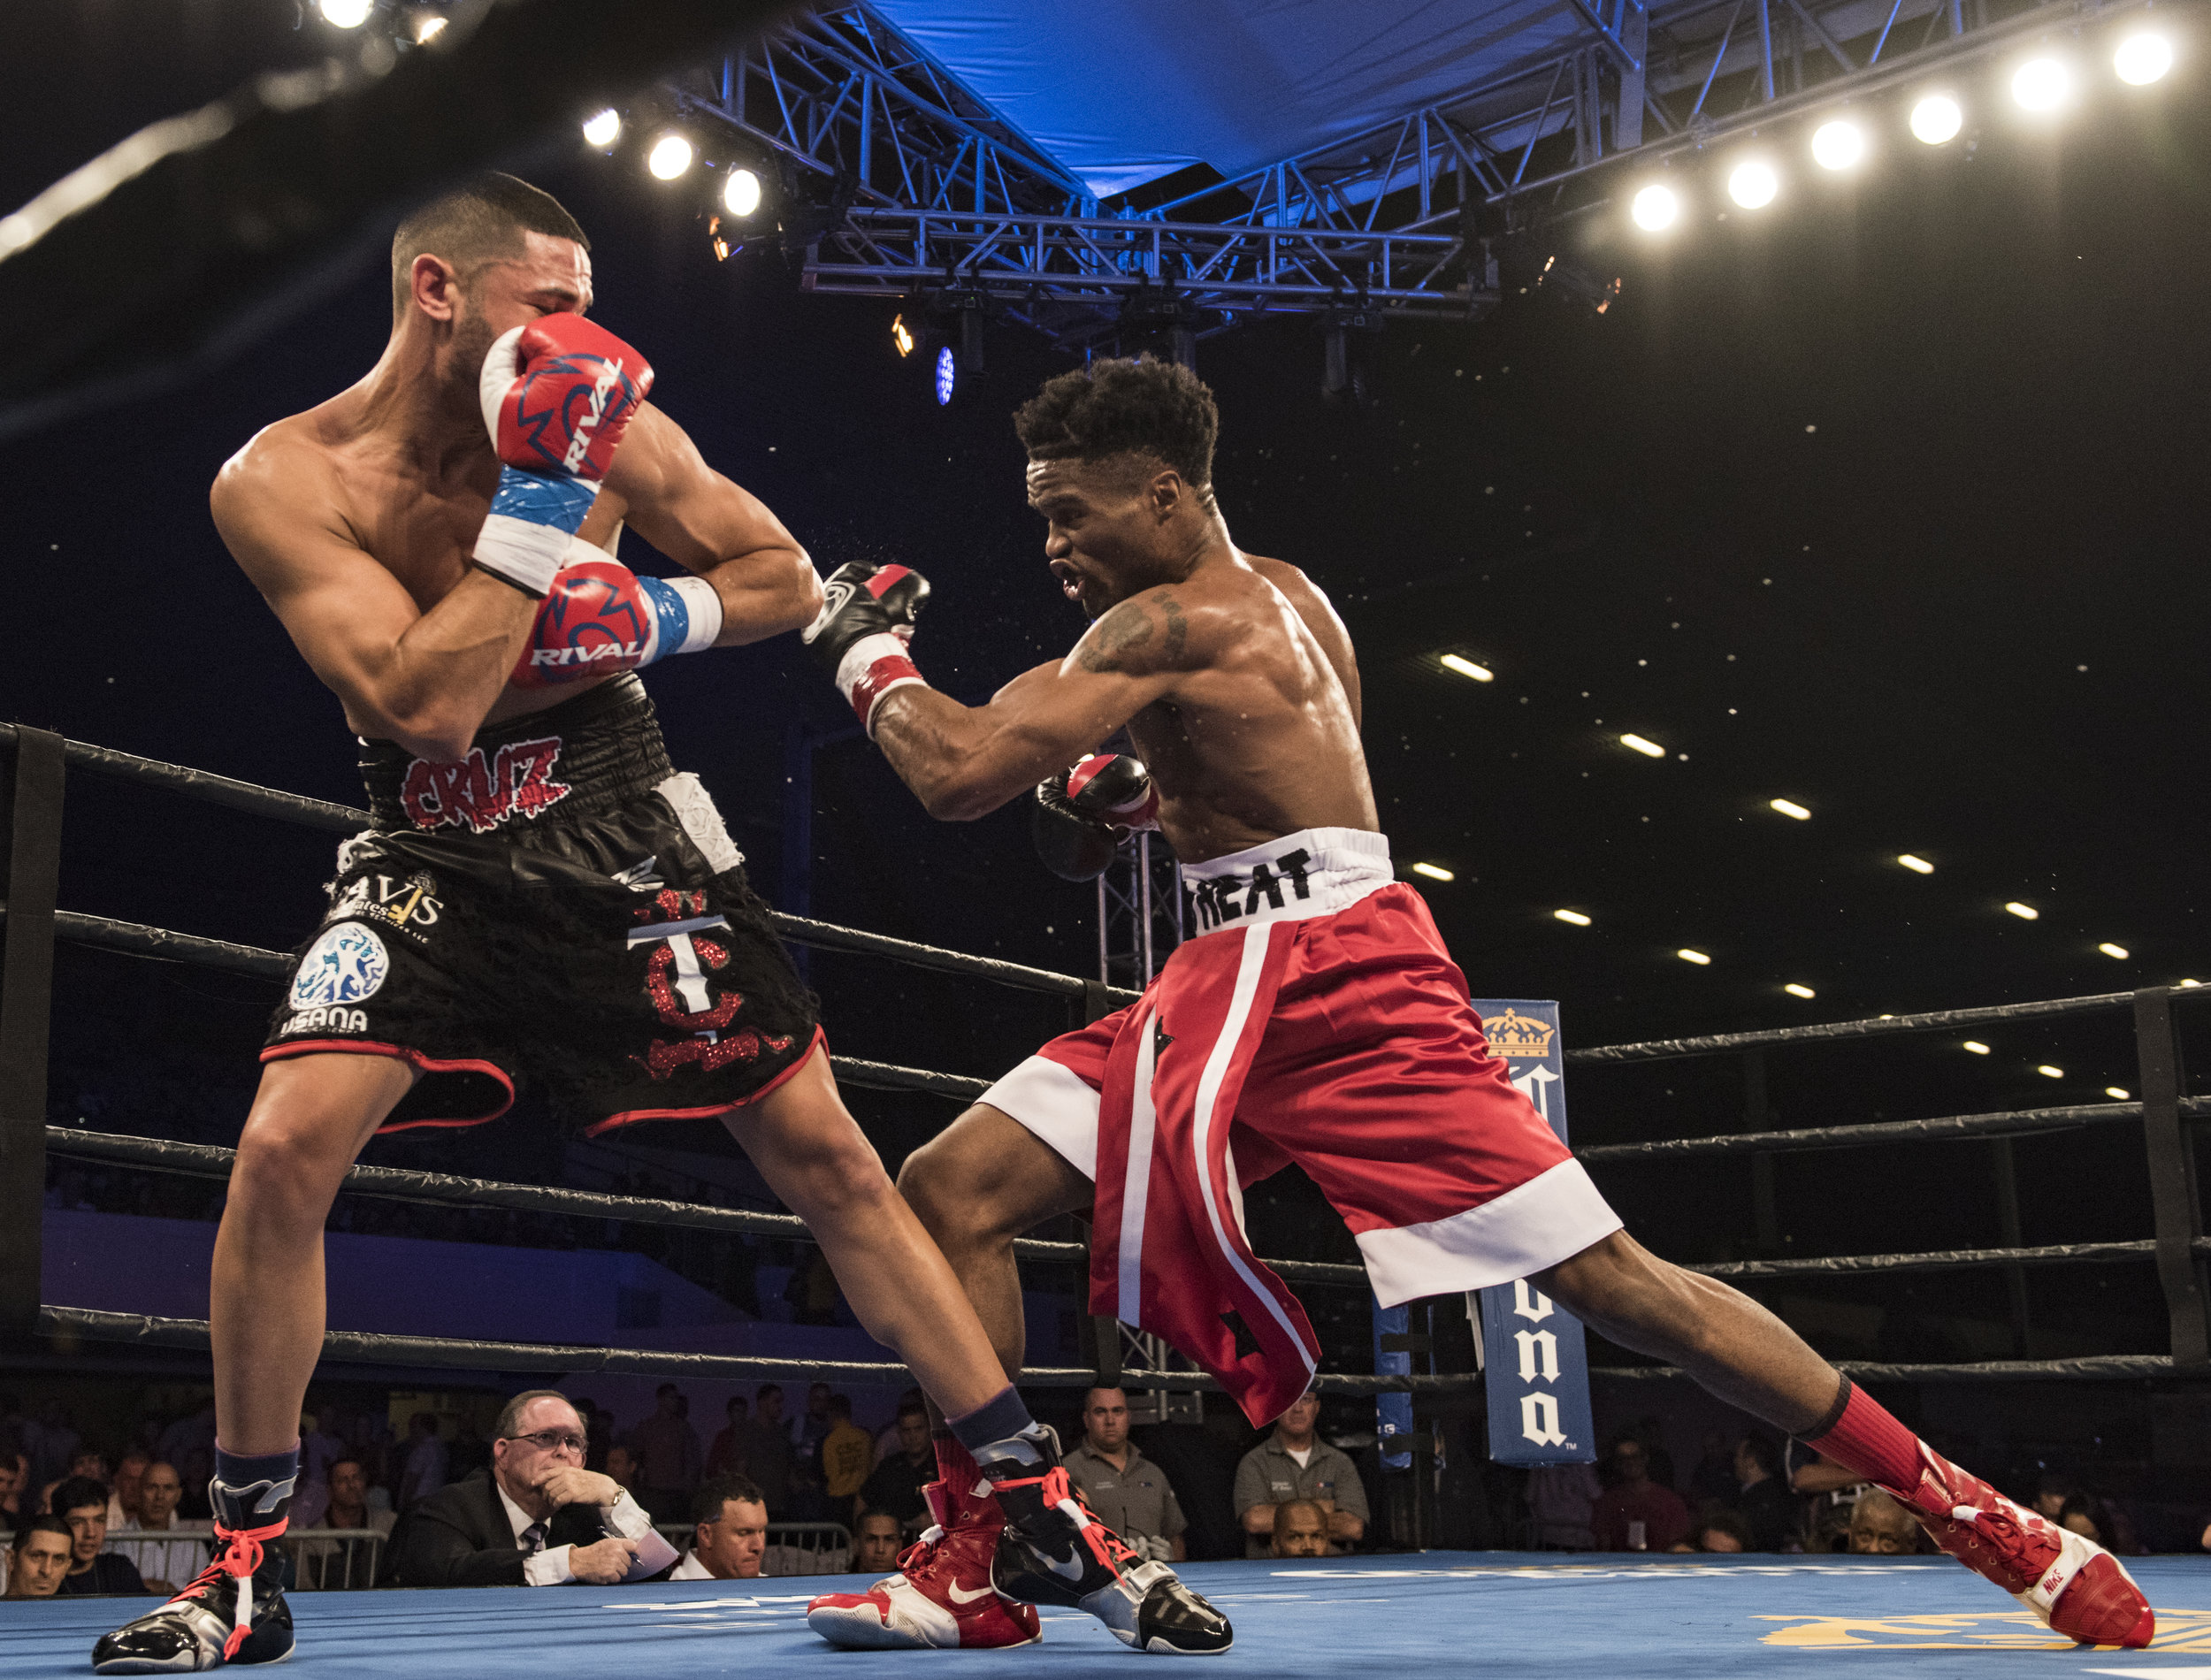 Alex Martin throws a hook in his fight against Robert Daniels Jr. at Hialeah Casino Park.